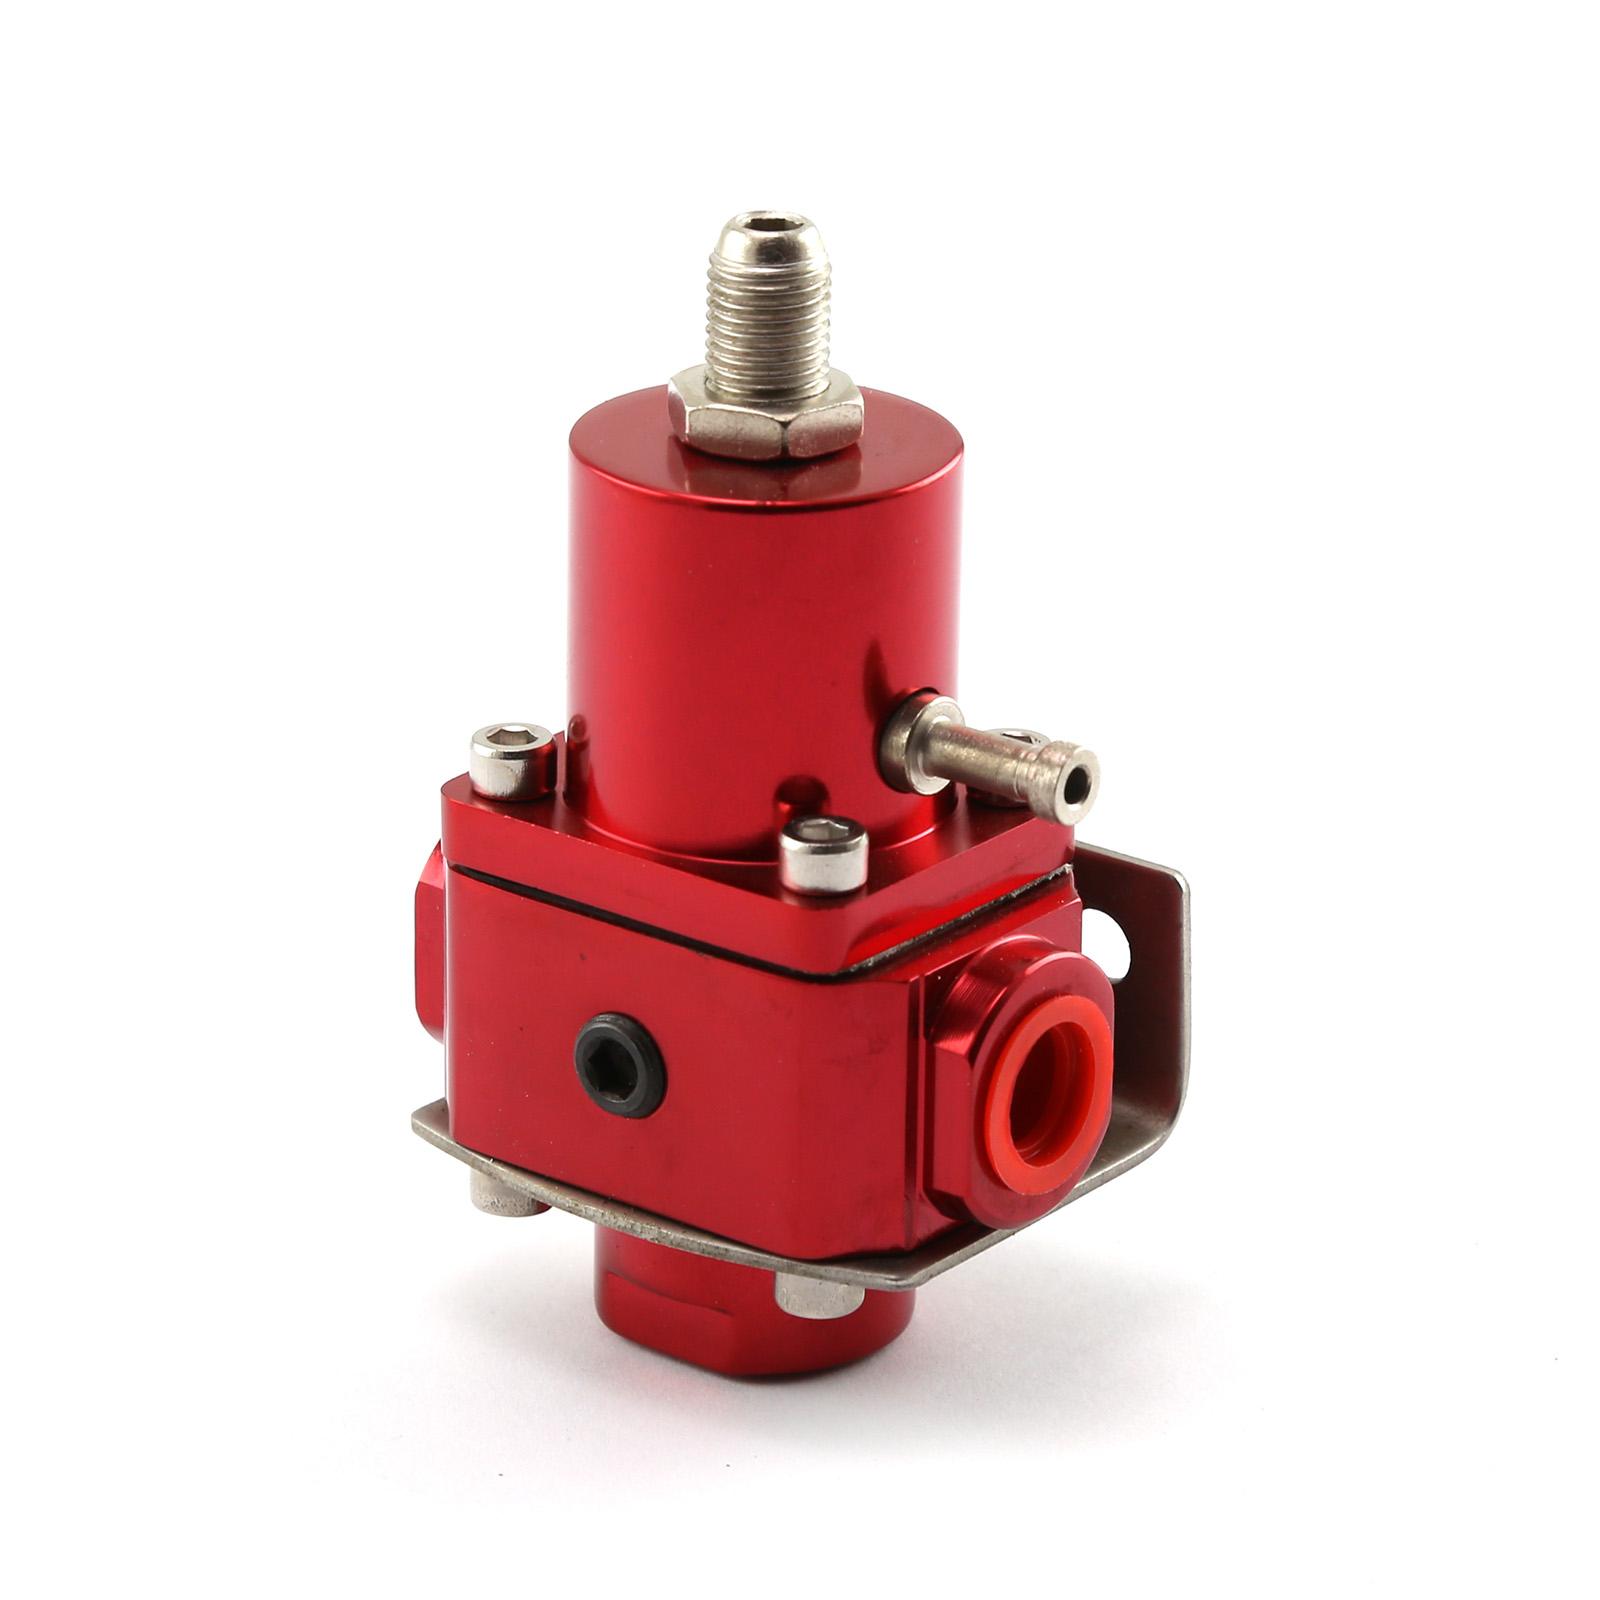 Universal - 10 AN EFI Fuel Pressure Regulator Red